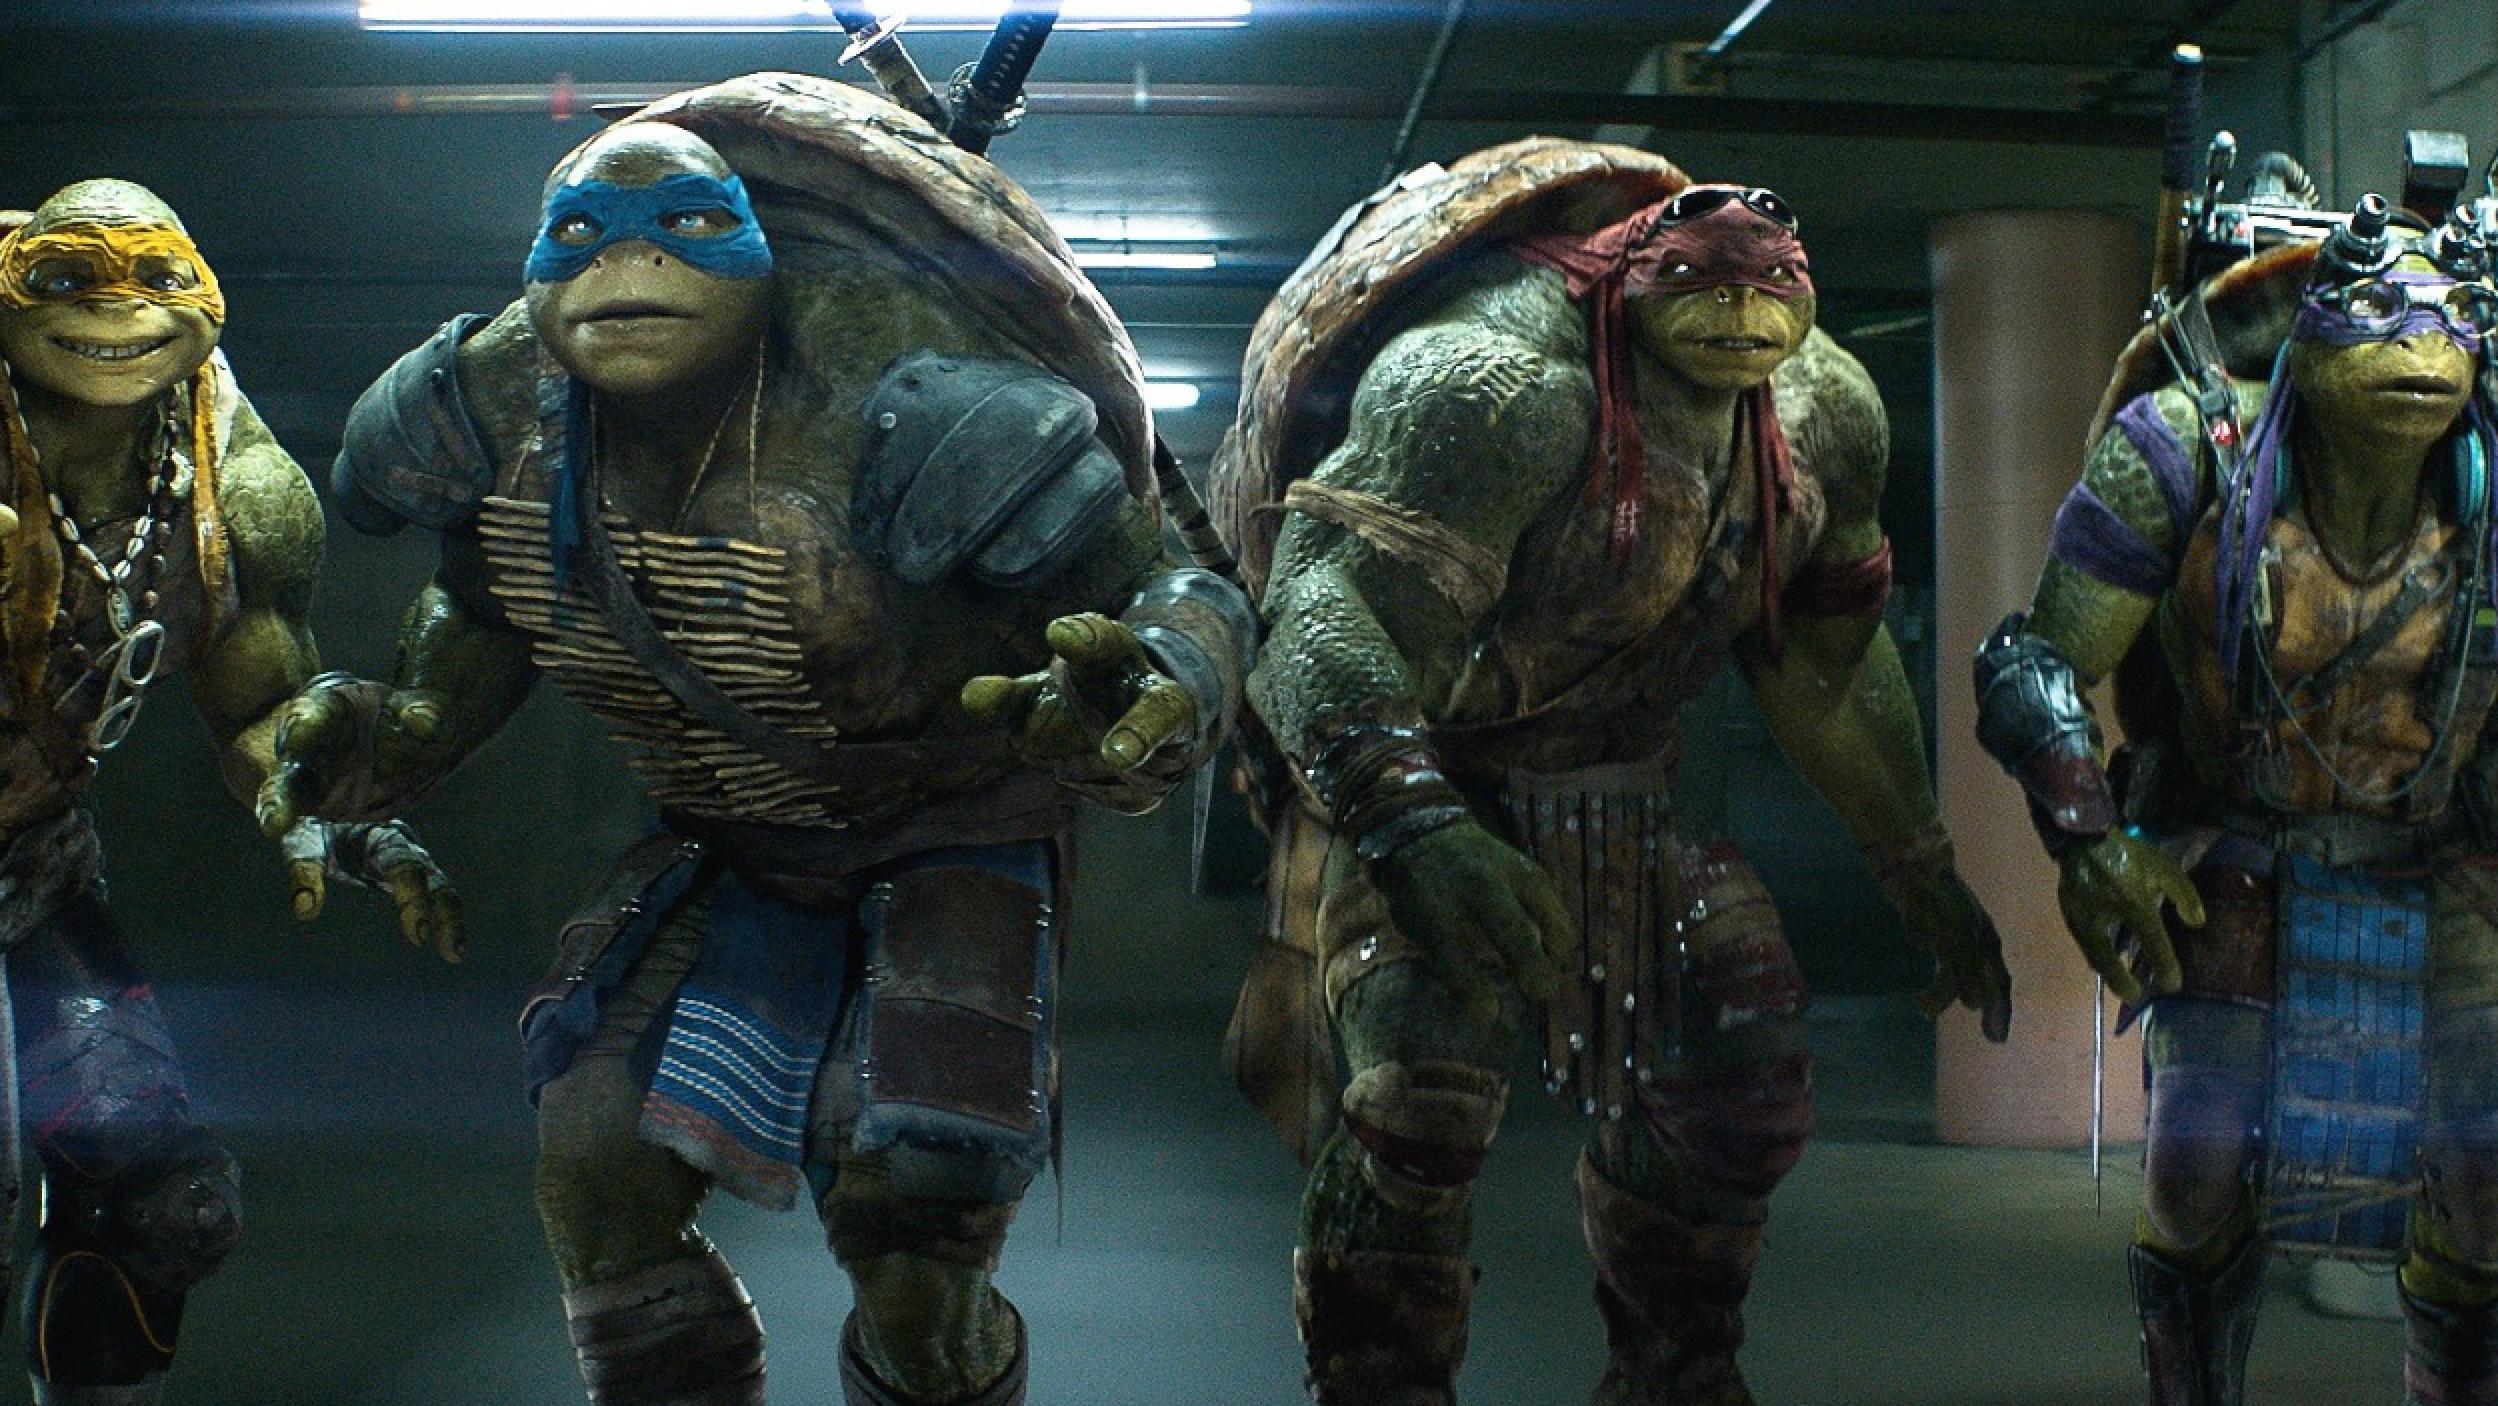 teenage-mutant-ninja-turtles-sequel-going-into-development